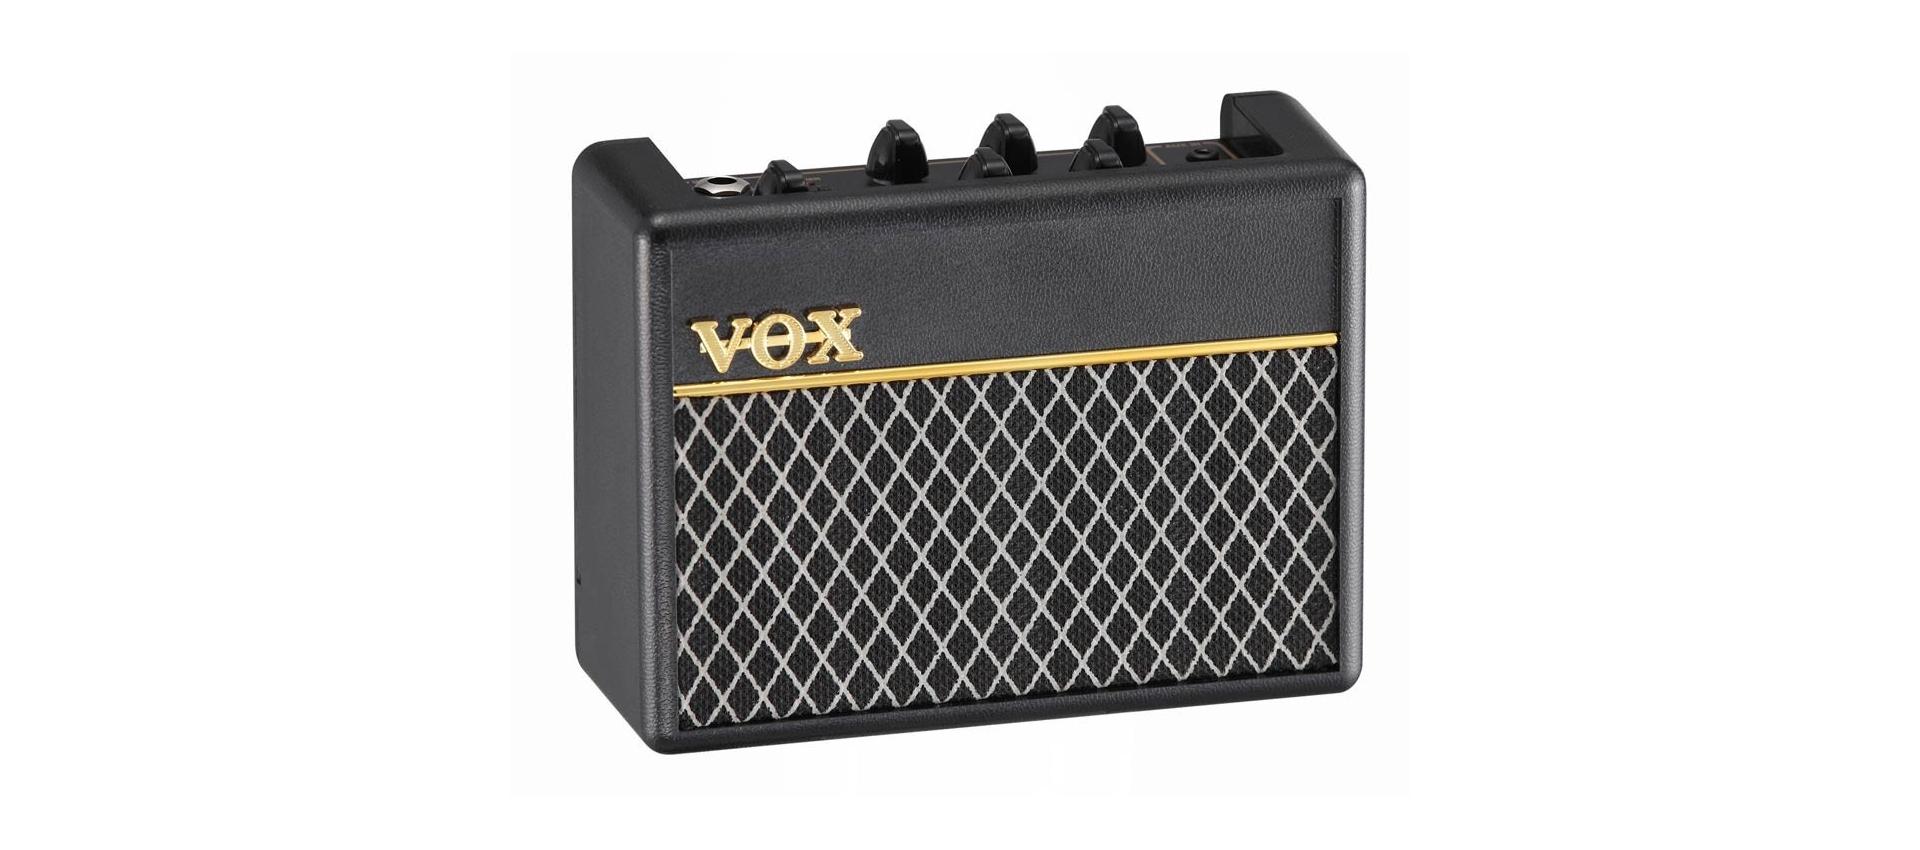 vox ac1 rv bass mini amp combo per basso. Black Bedroom Furniture Sets. Home Design Ideas